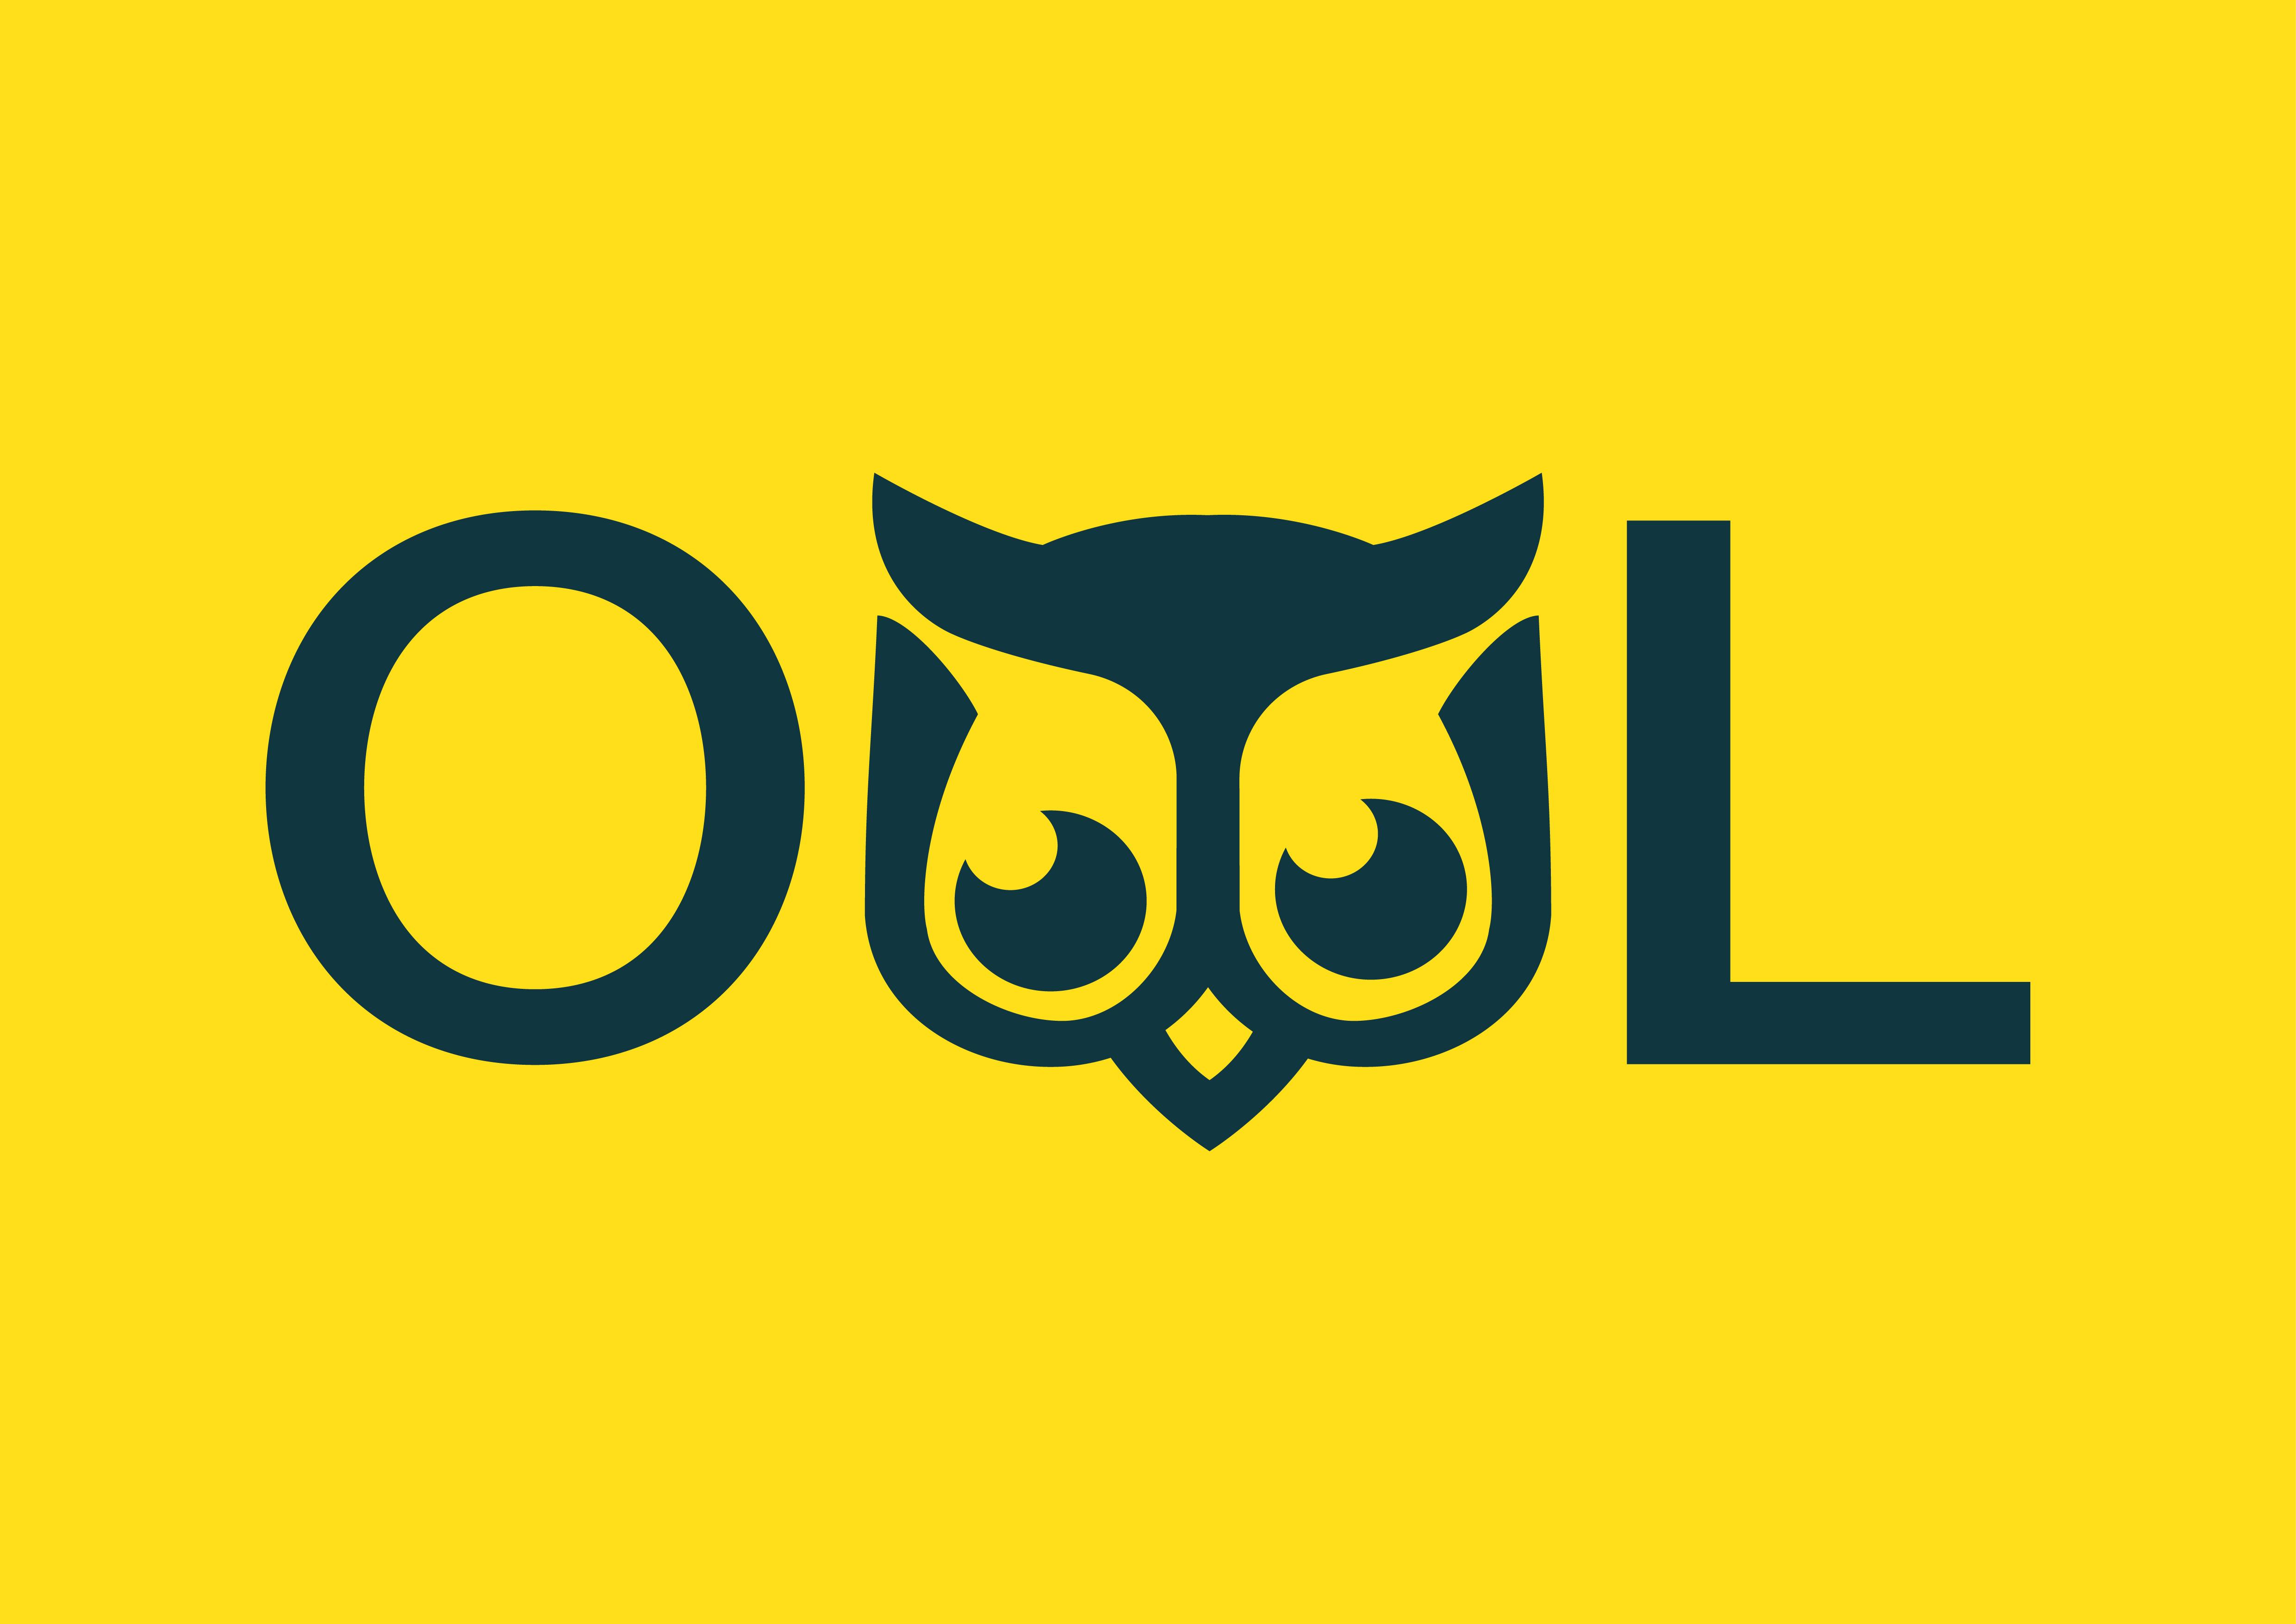 I will design modern minimalist and creative professional unique business logo